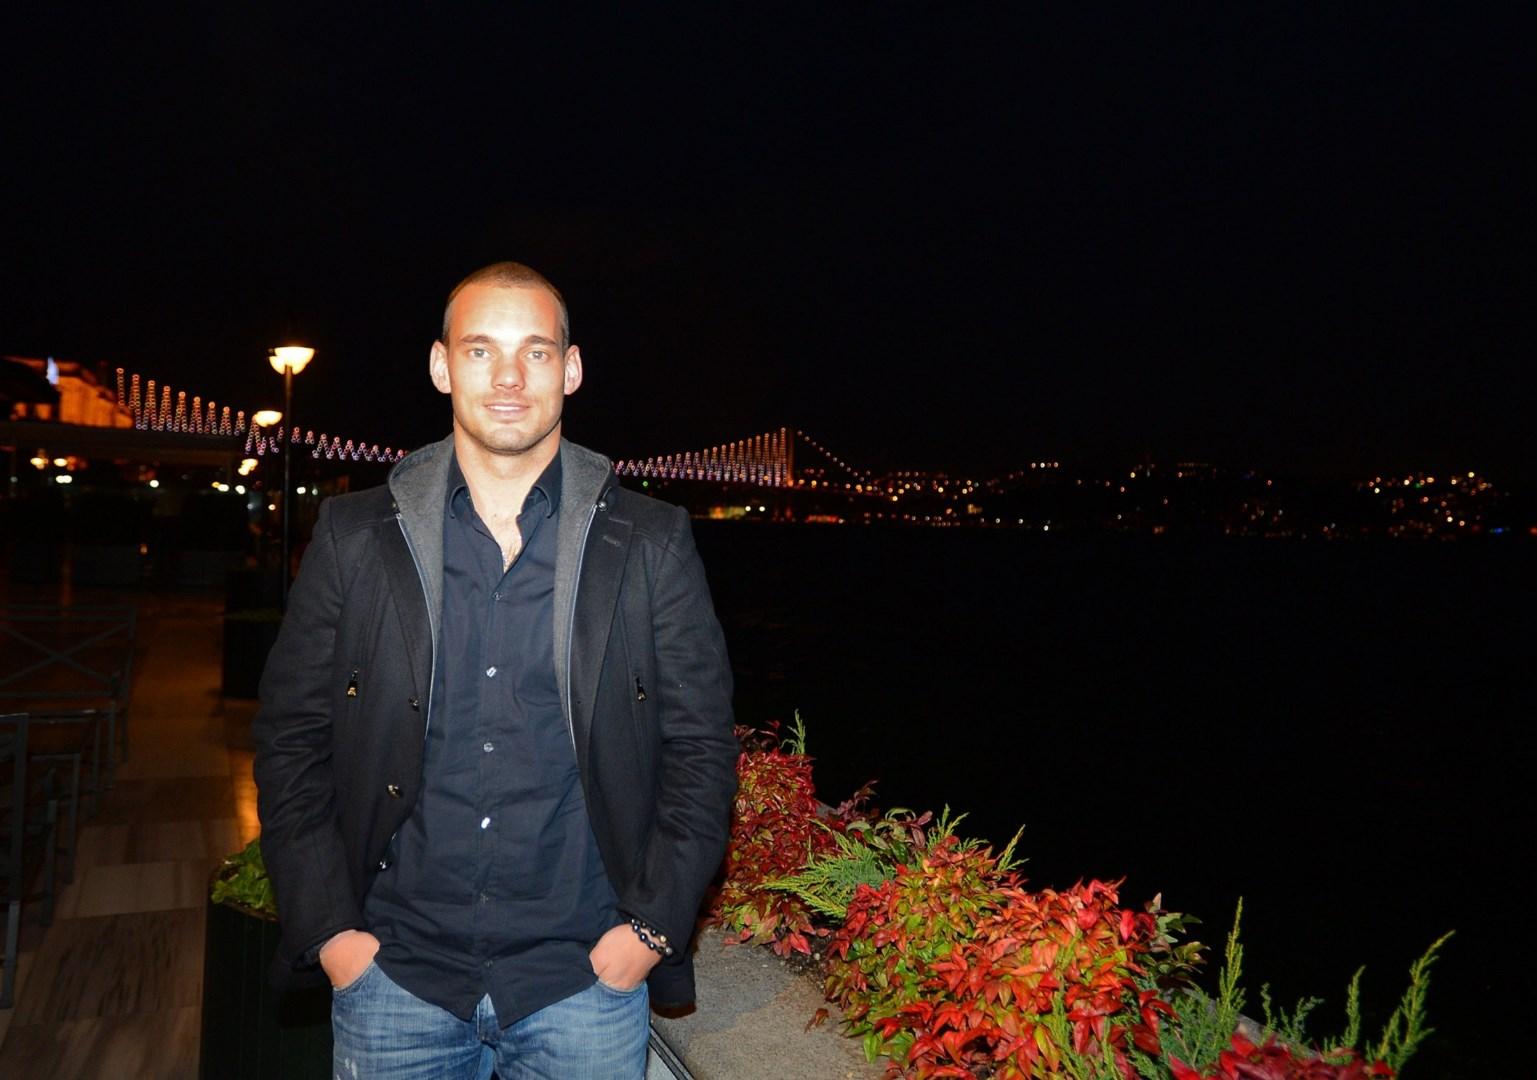 wesley+sneijder+galatasaray+resimleri+rooteto+19 Wesley Sneijder Galatasaray HD Resimleri